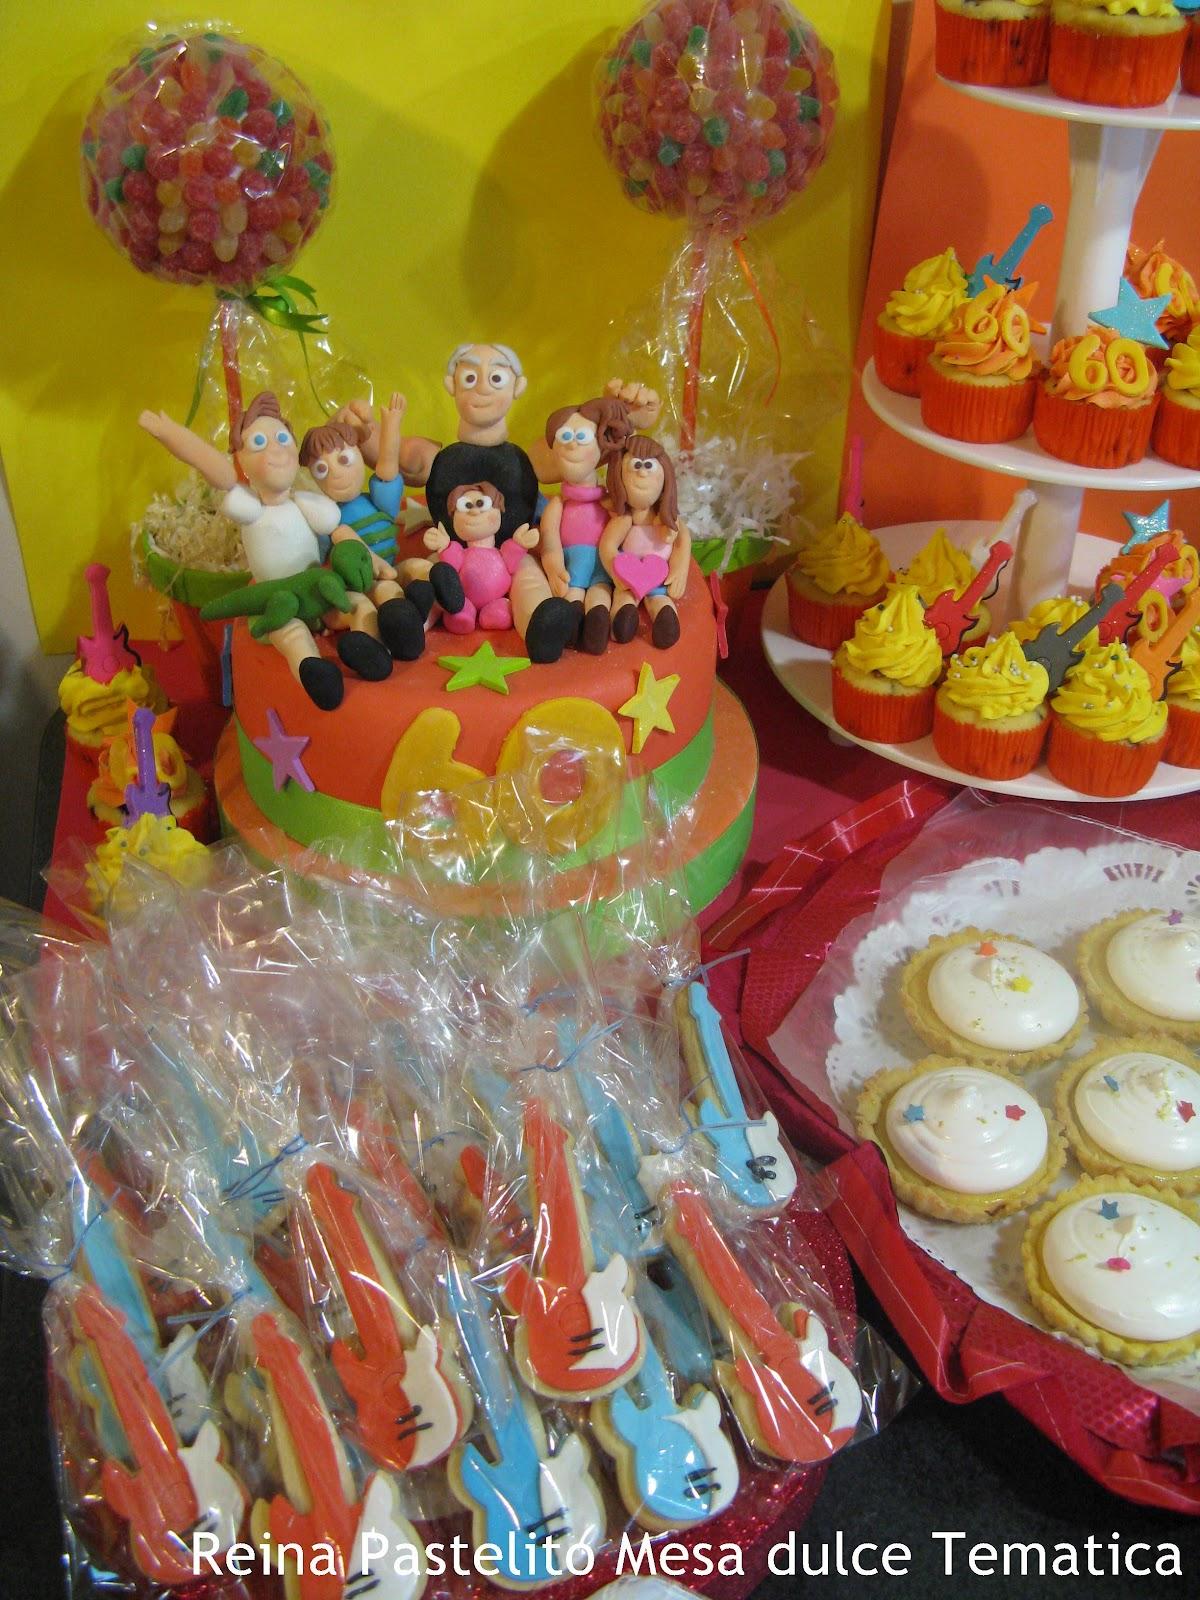 Reina Pastelito Cupcakes Tortas Mesa Dulce para un cumpleaos de 60